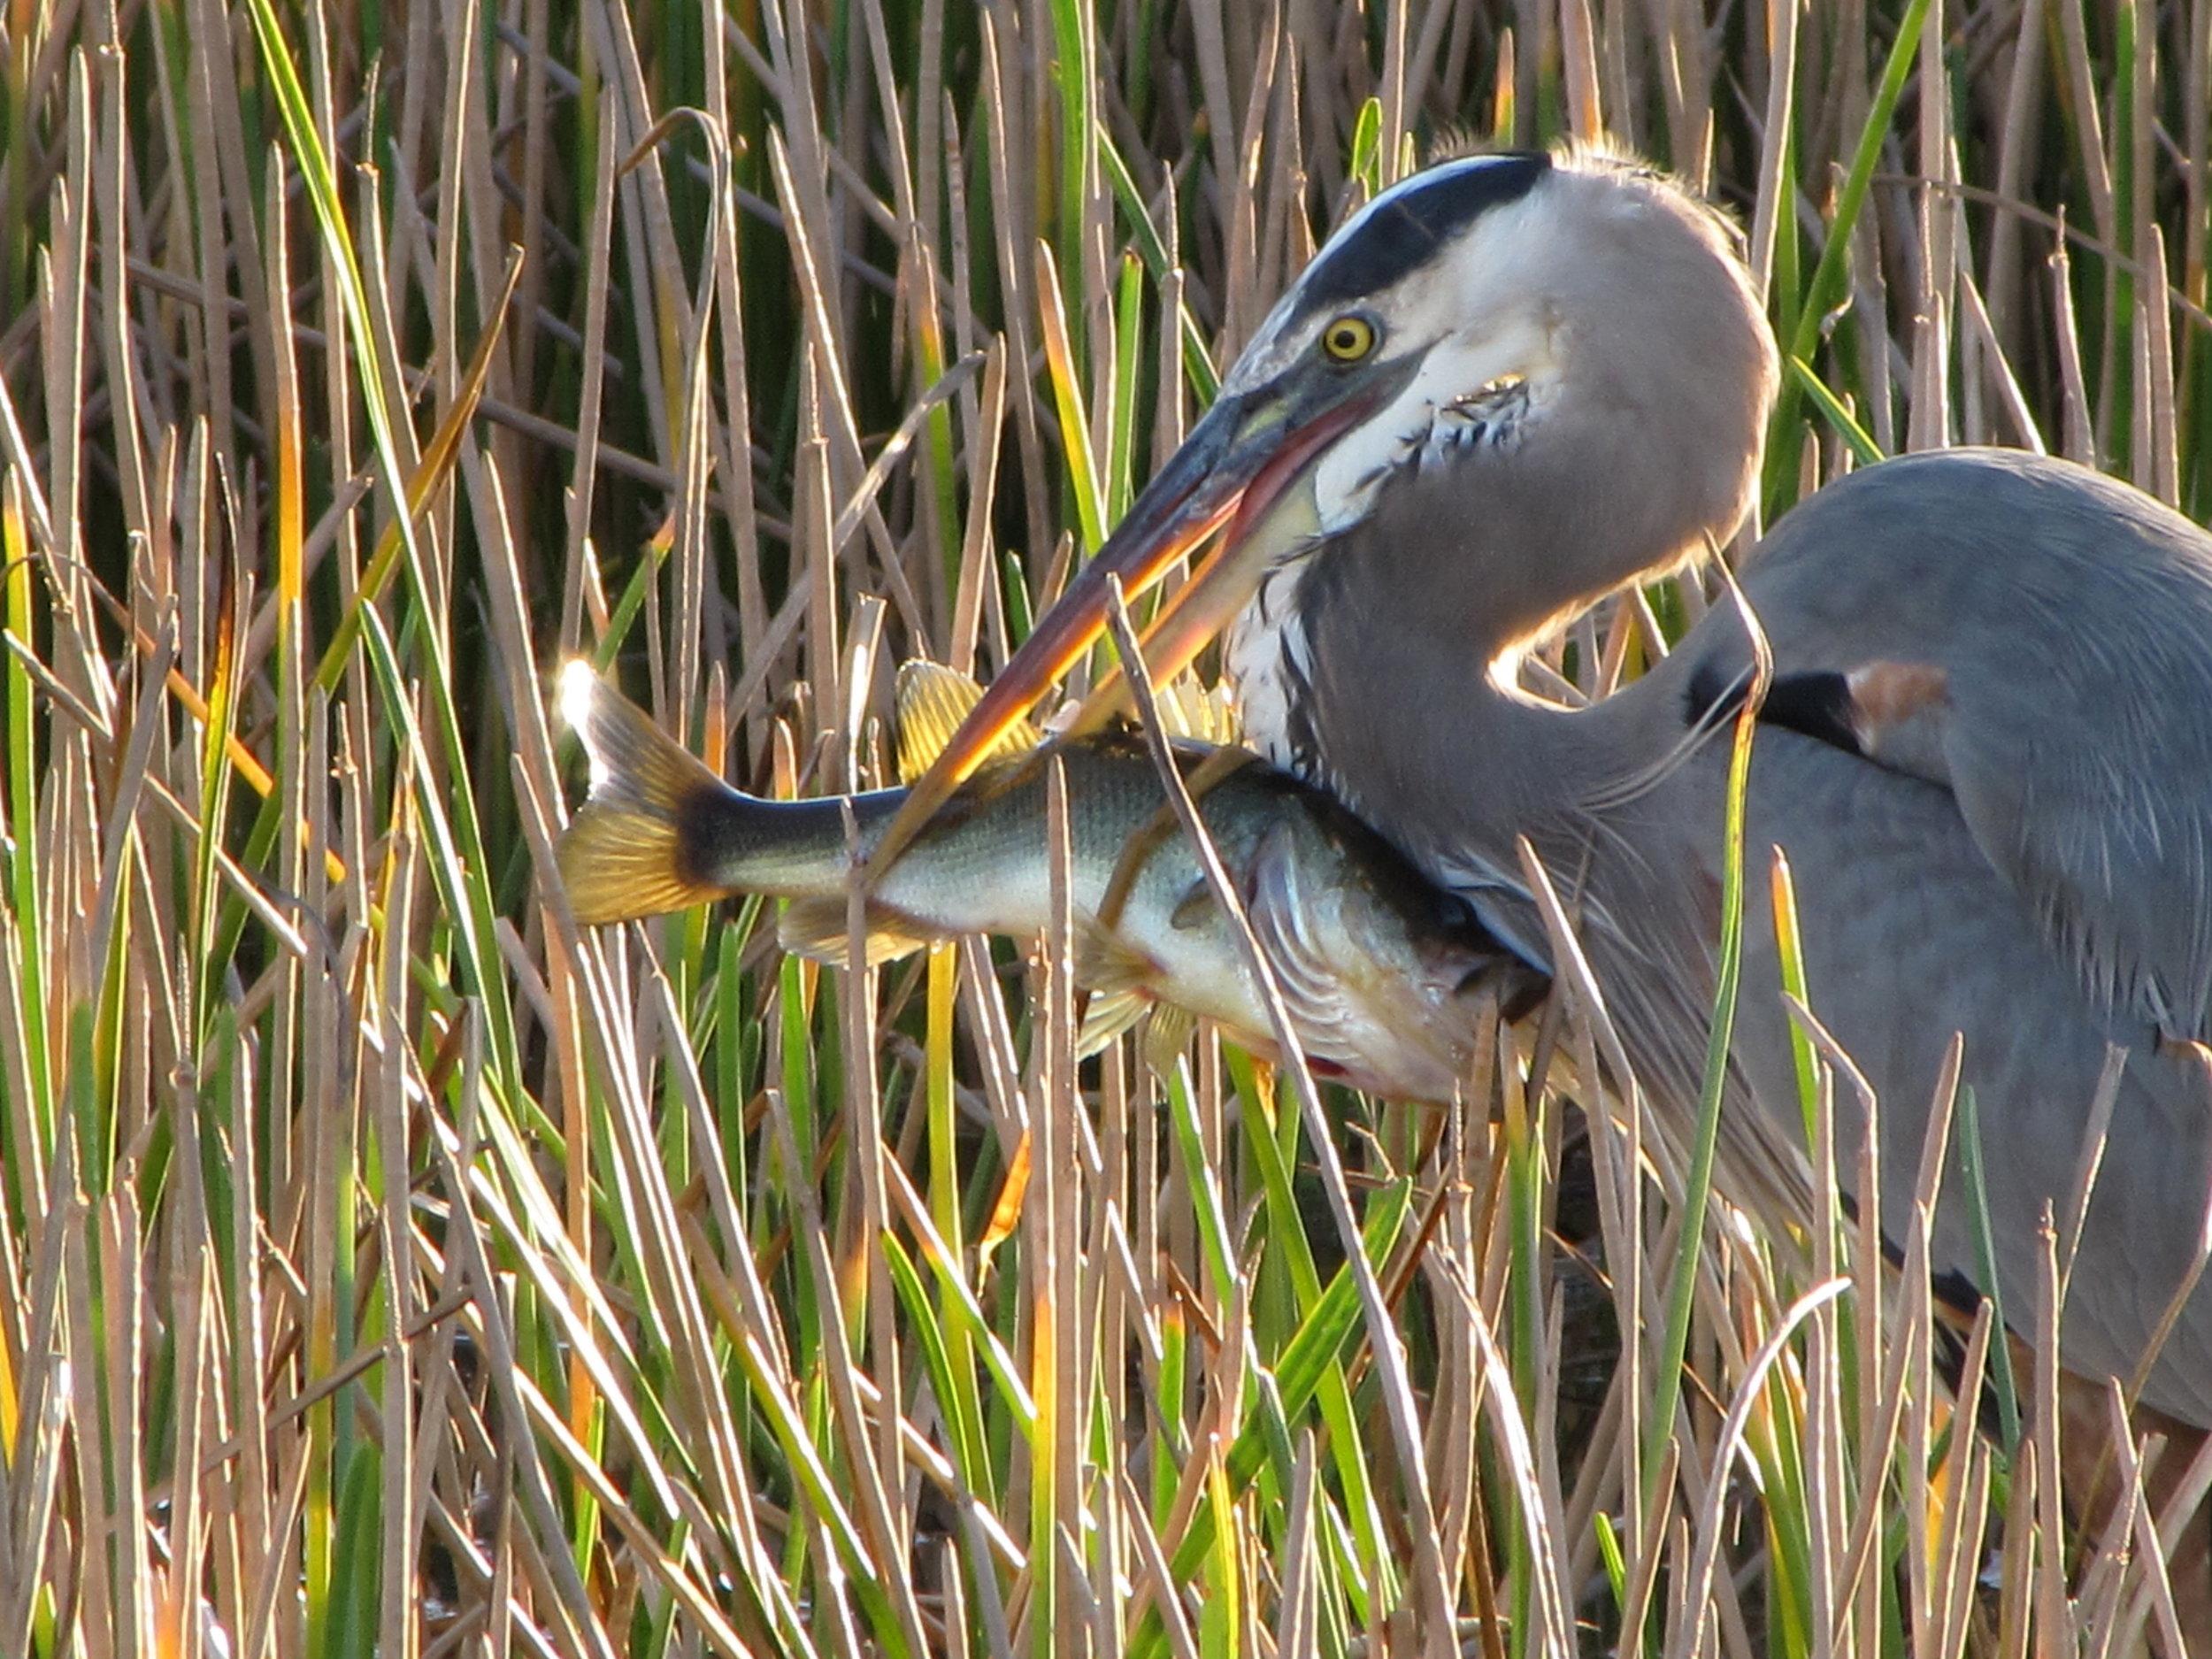 heron with fish 1113 2.jpg